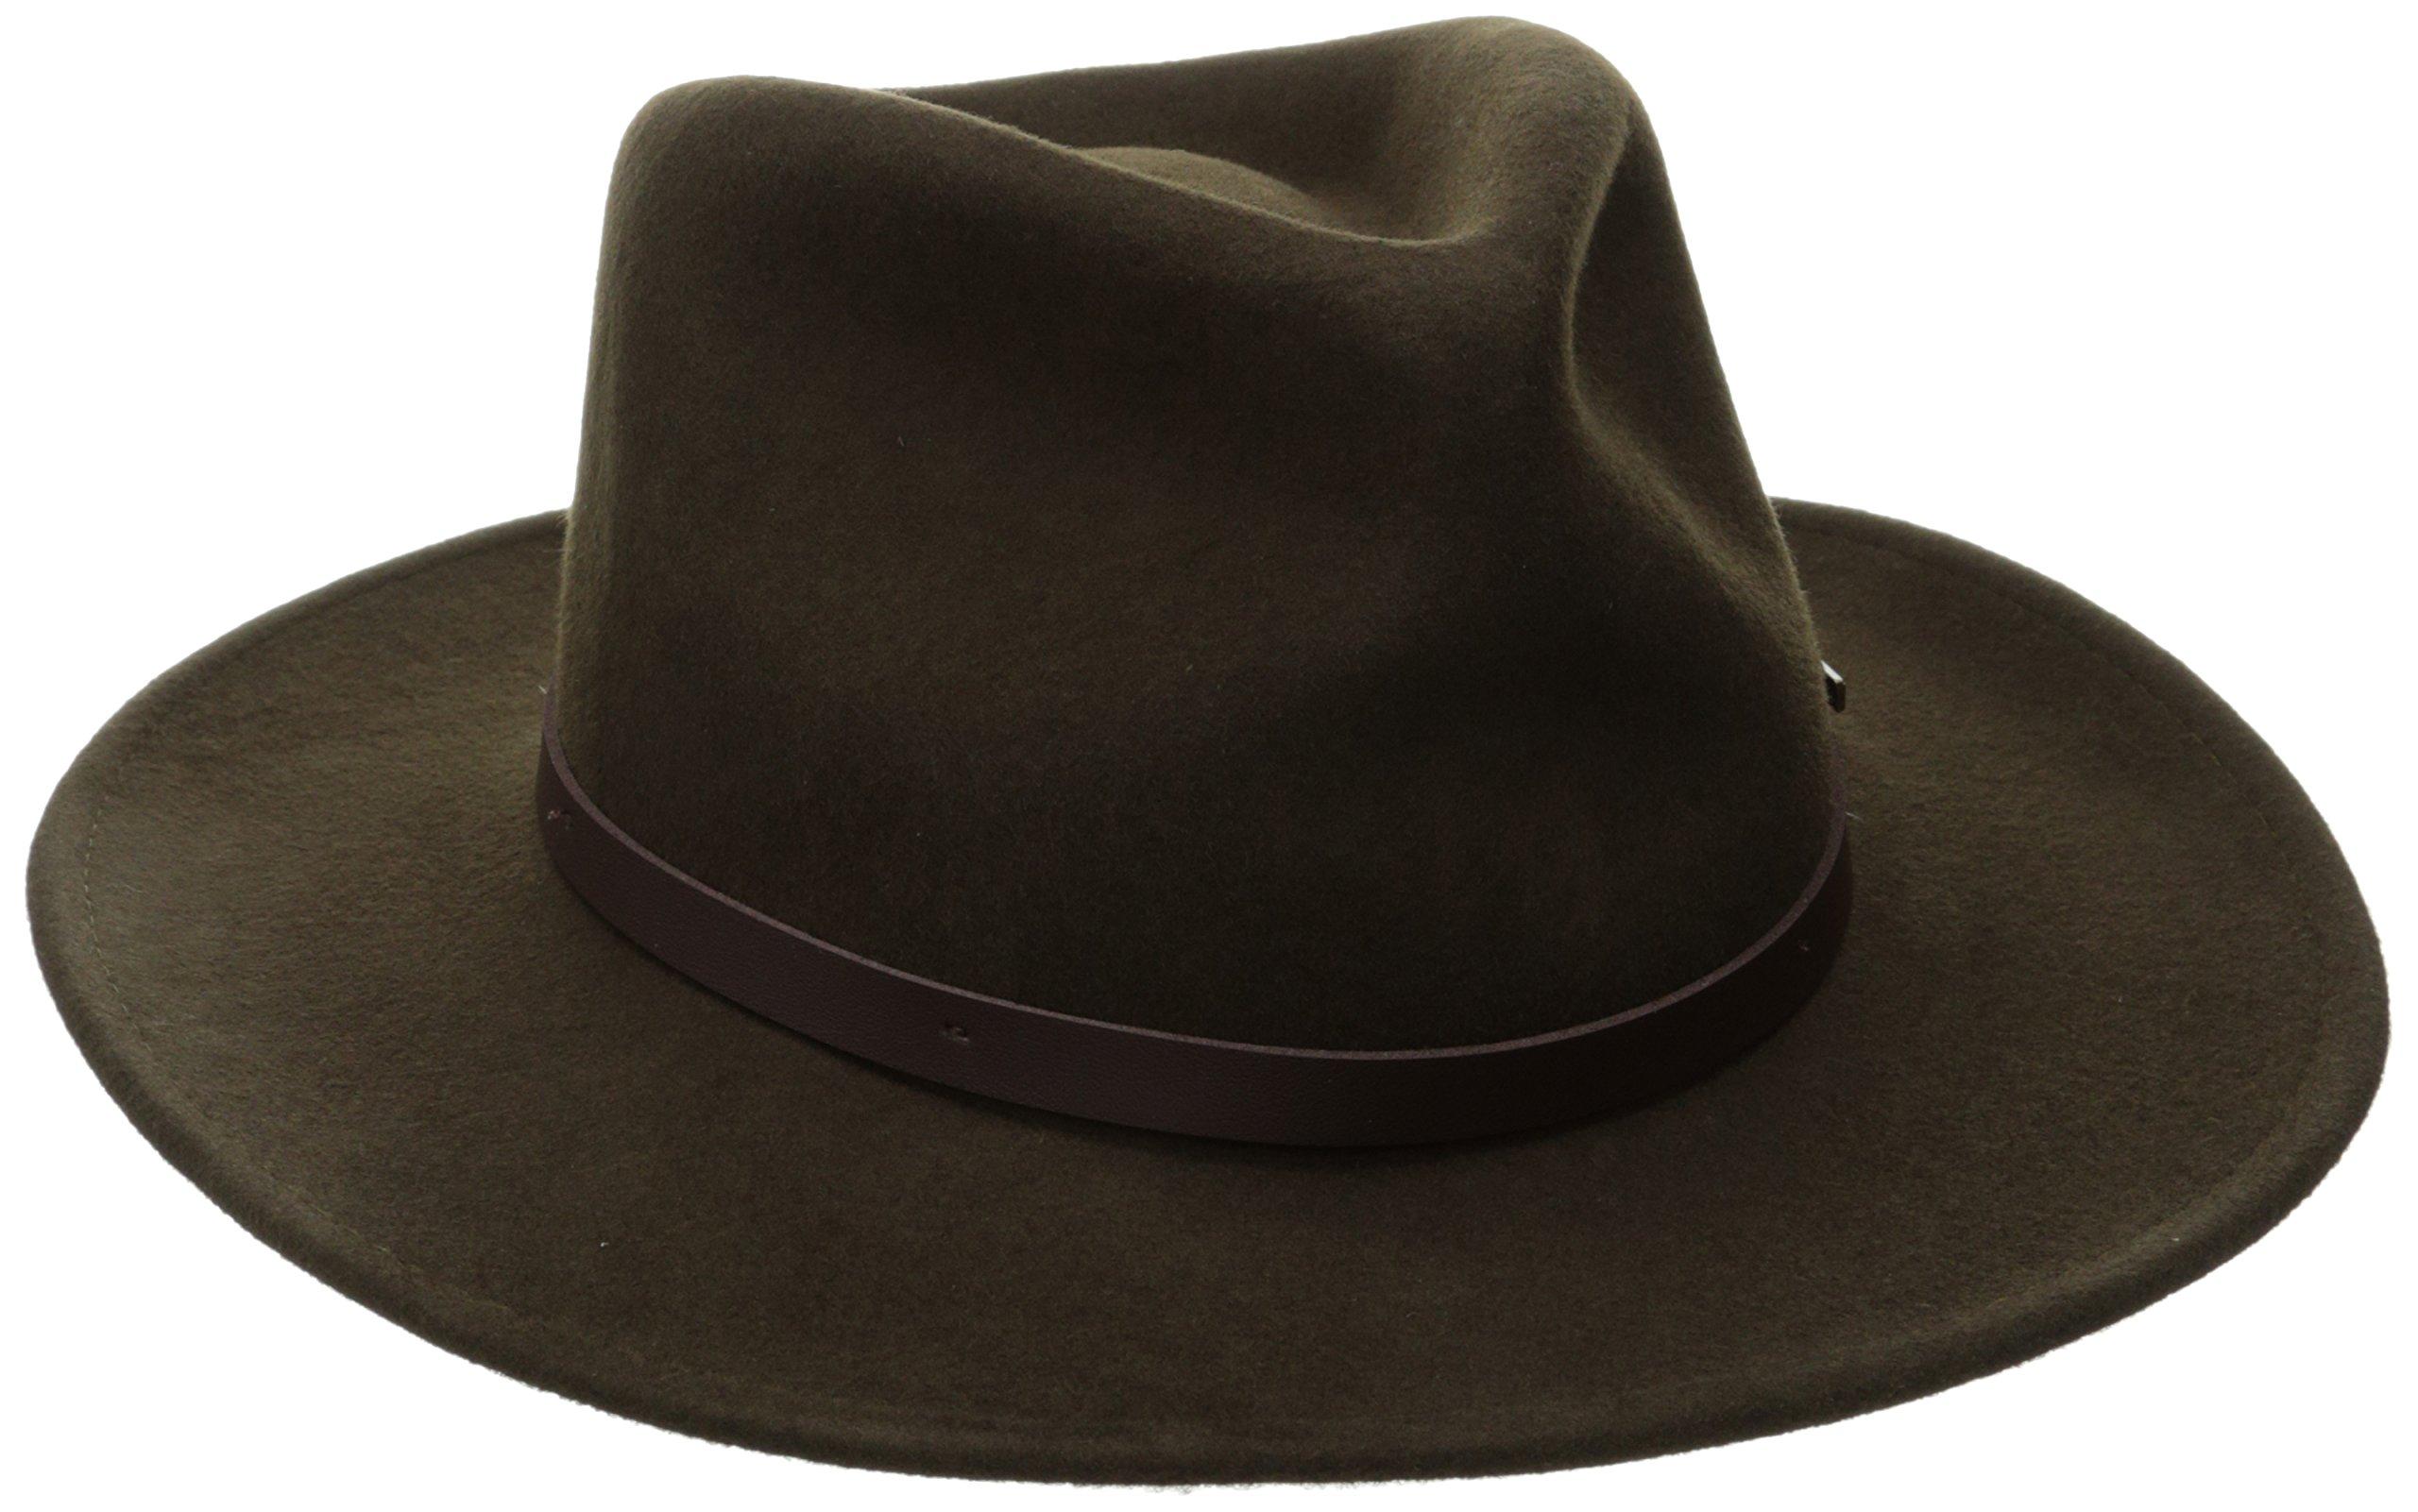 37d0972a196fe Woolrich Men s Crush Felt Outback Hat